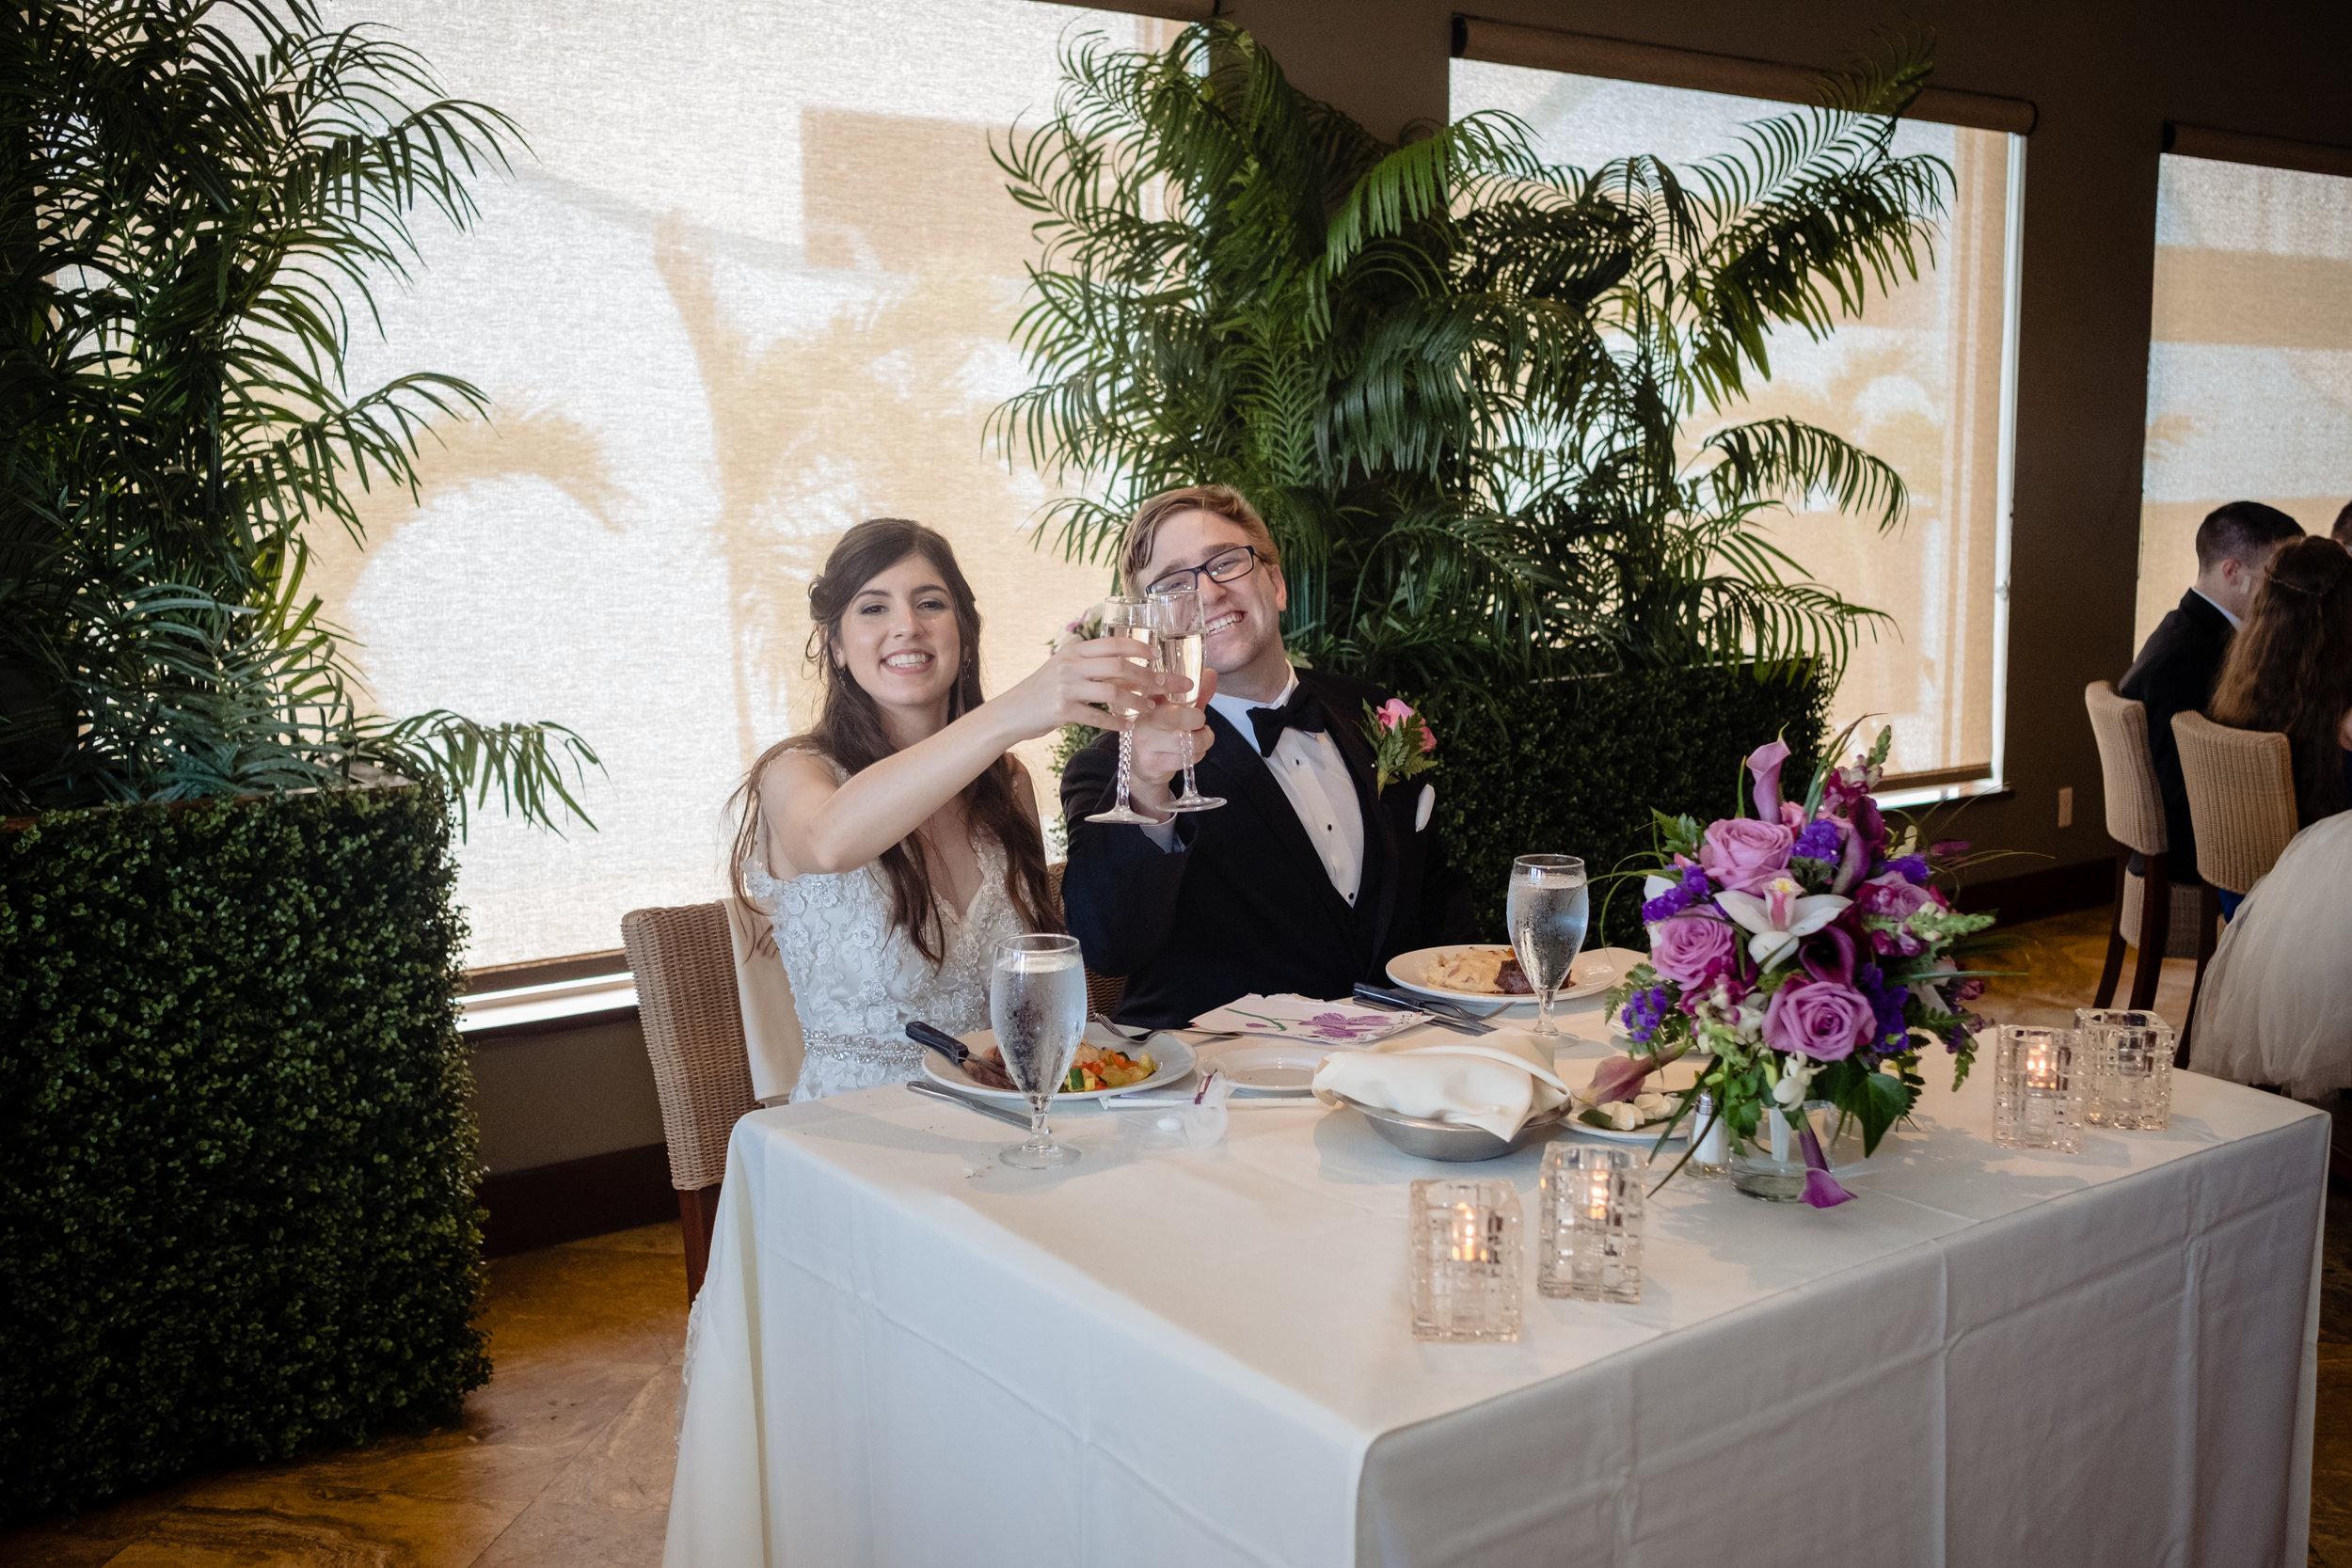 HAH_Zoe and Daniel_Clearwater Wedding_490_2018.jpg